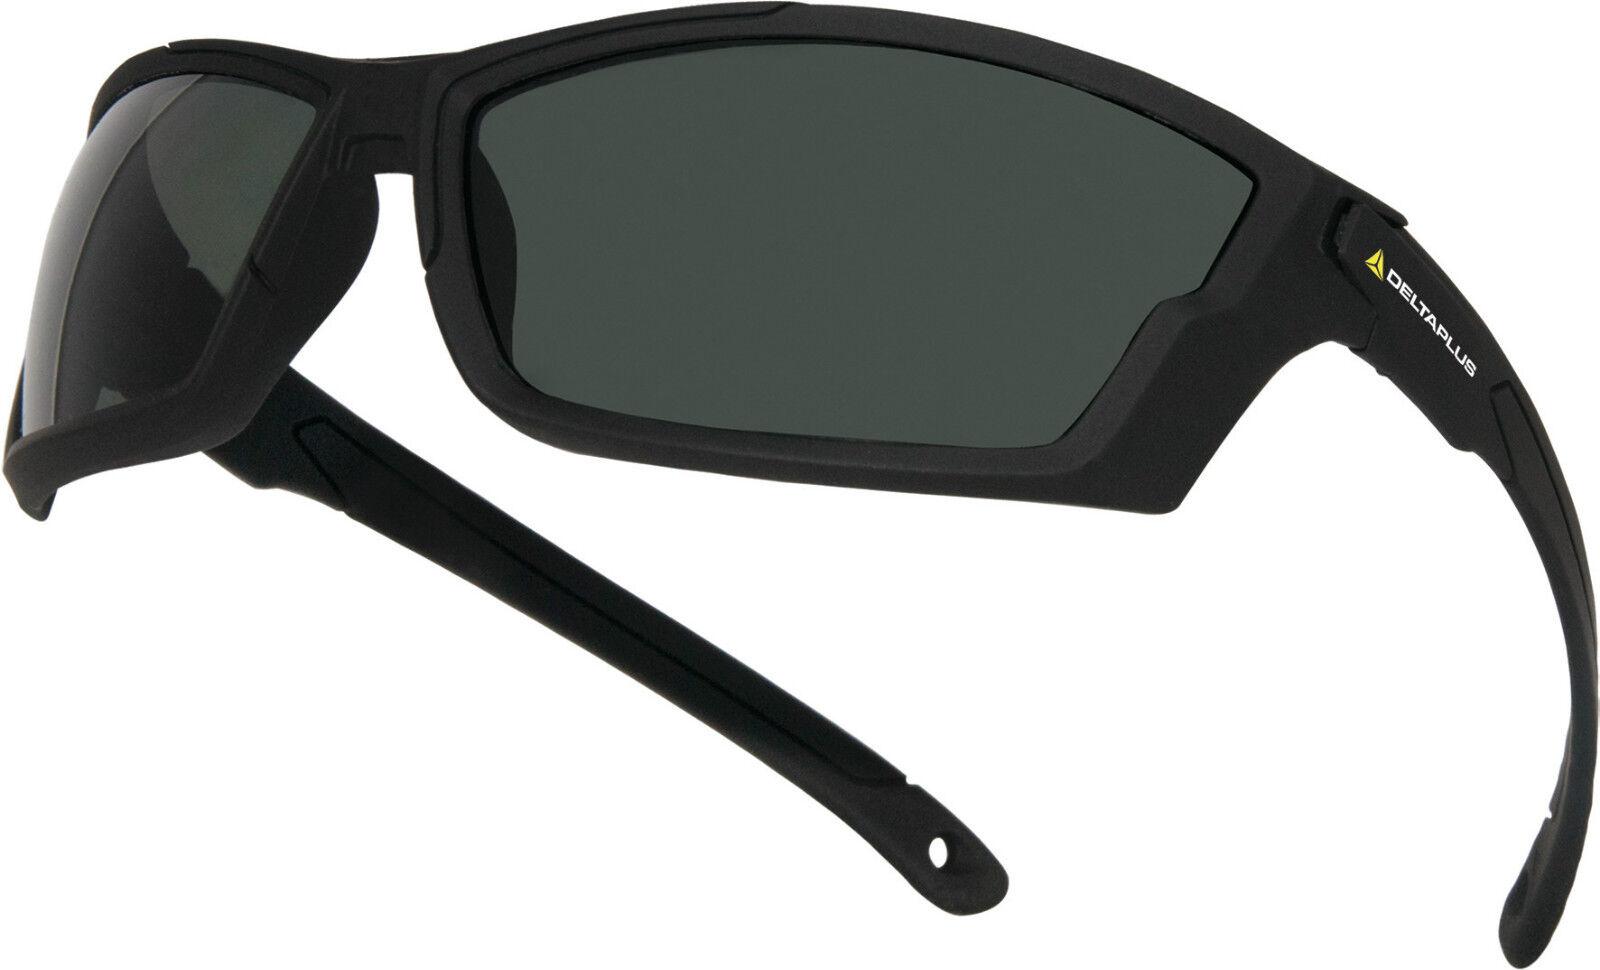 Delta Plus Venitex Kilauea Predective Cycling Polarised Sunglasses Glasses Specs